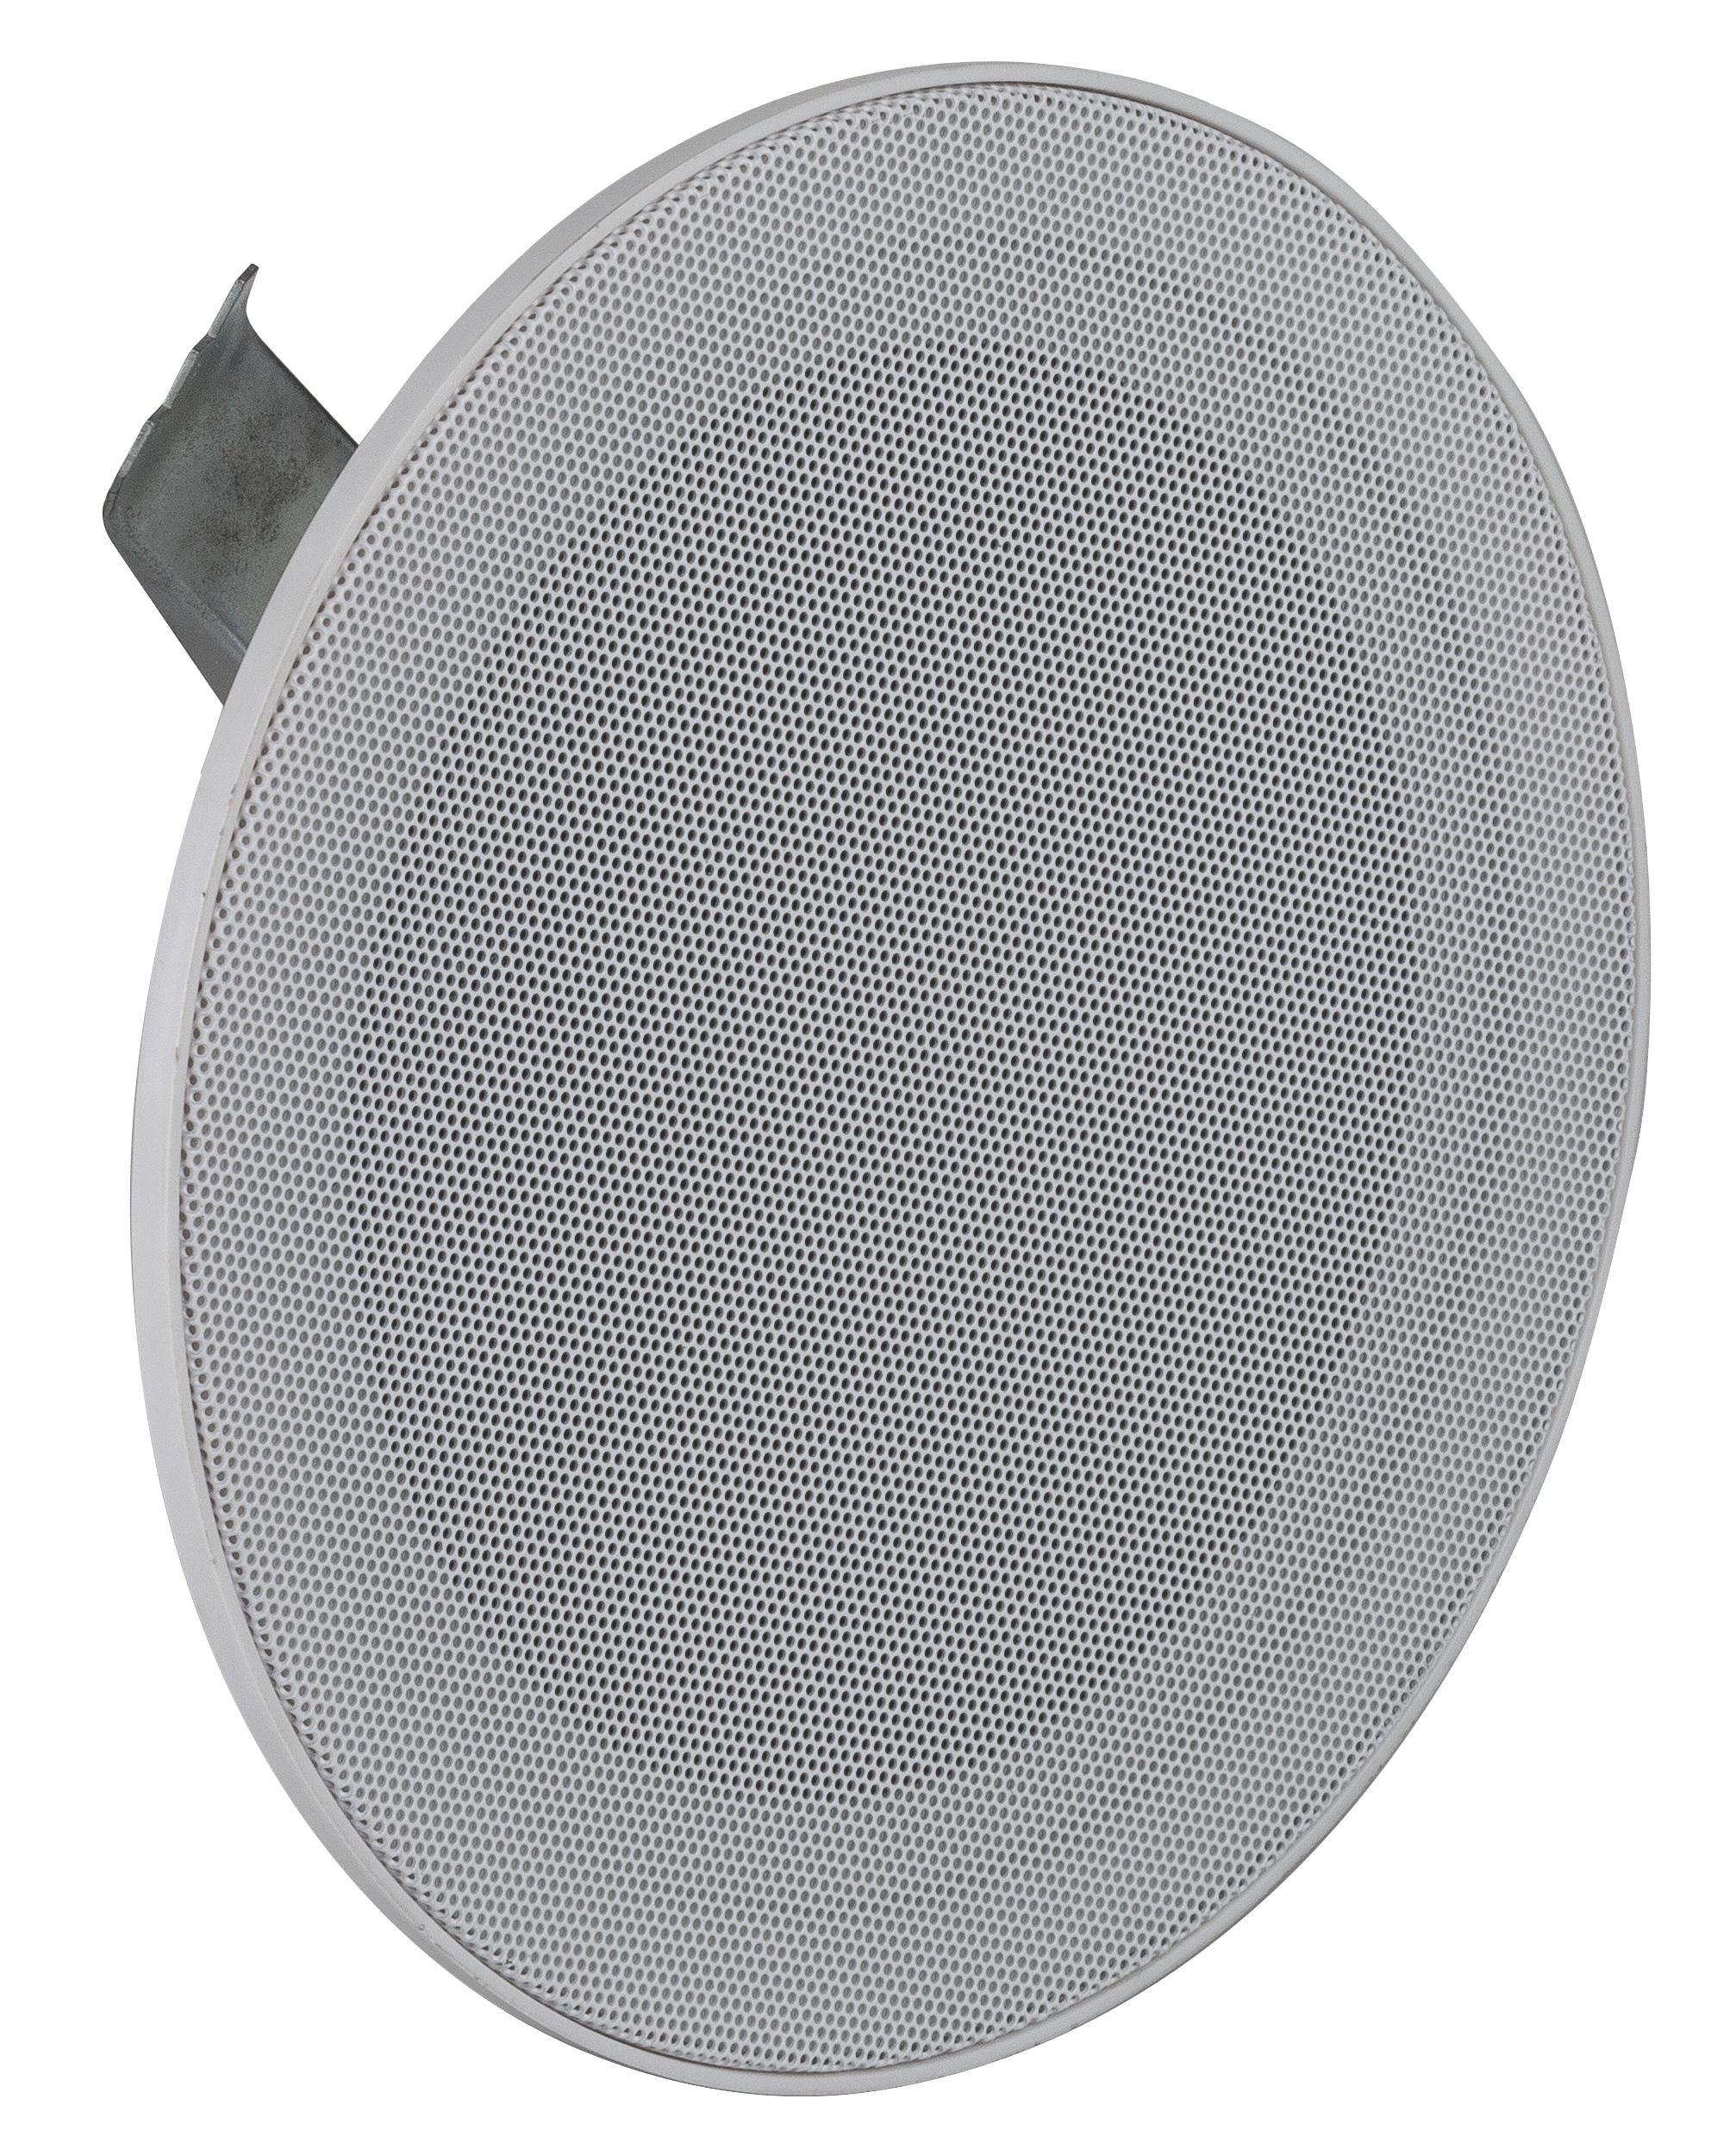 Recessed ceiling speaker for 100V amplifiers